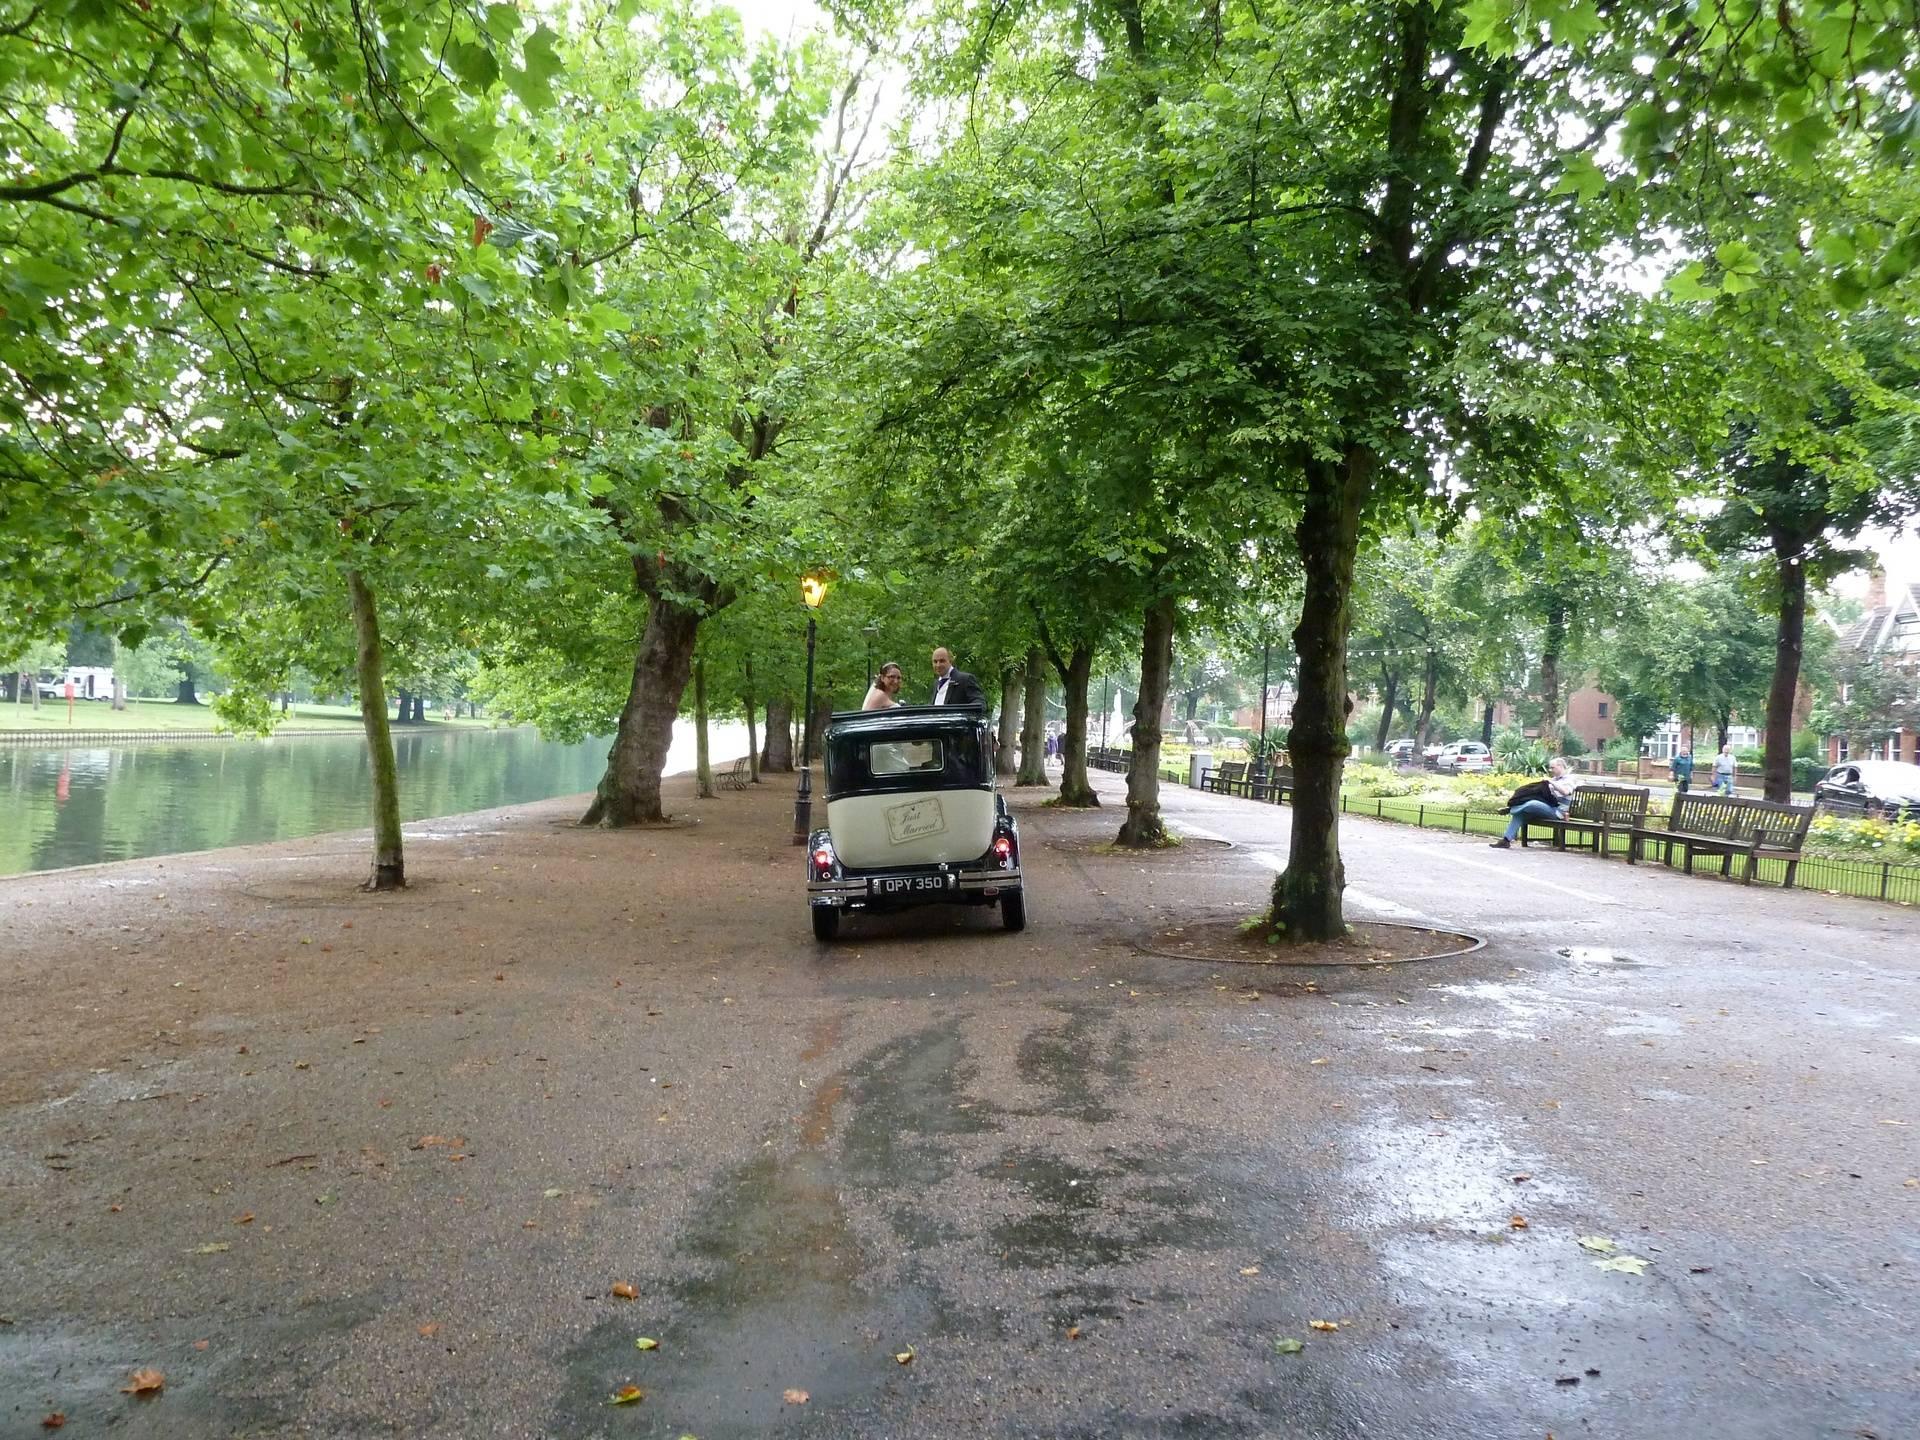 The Embankment Bedford